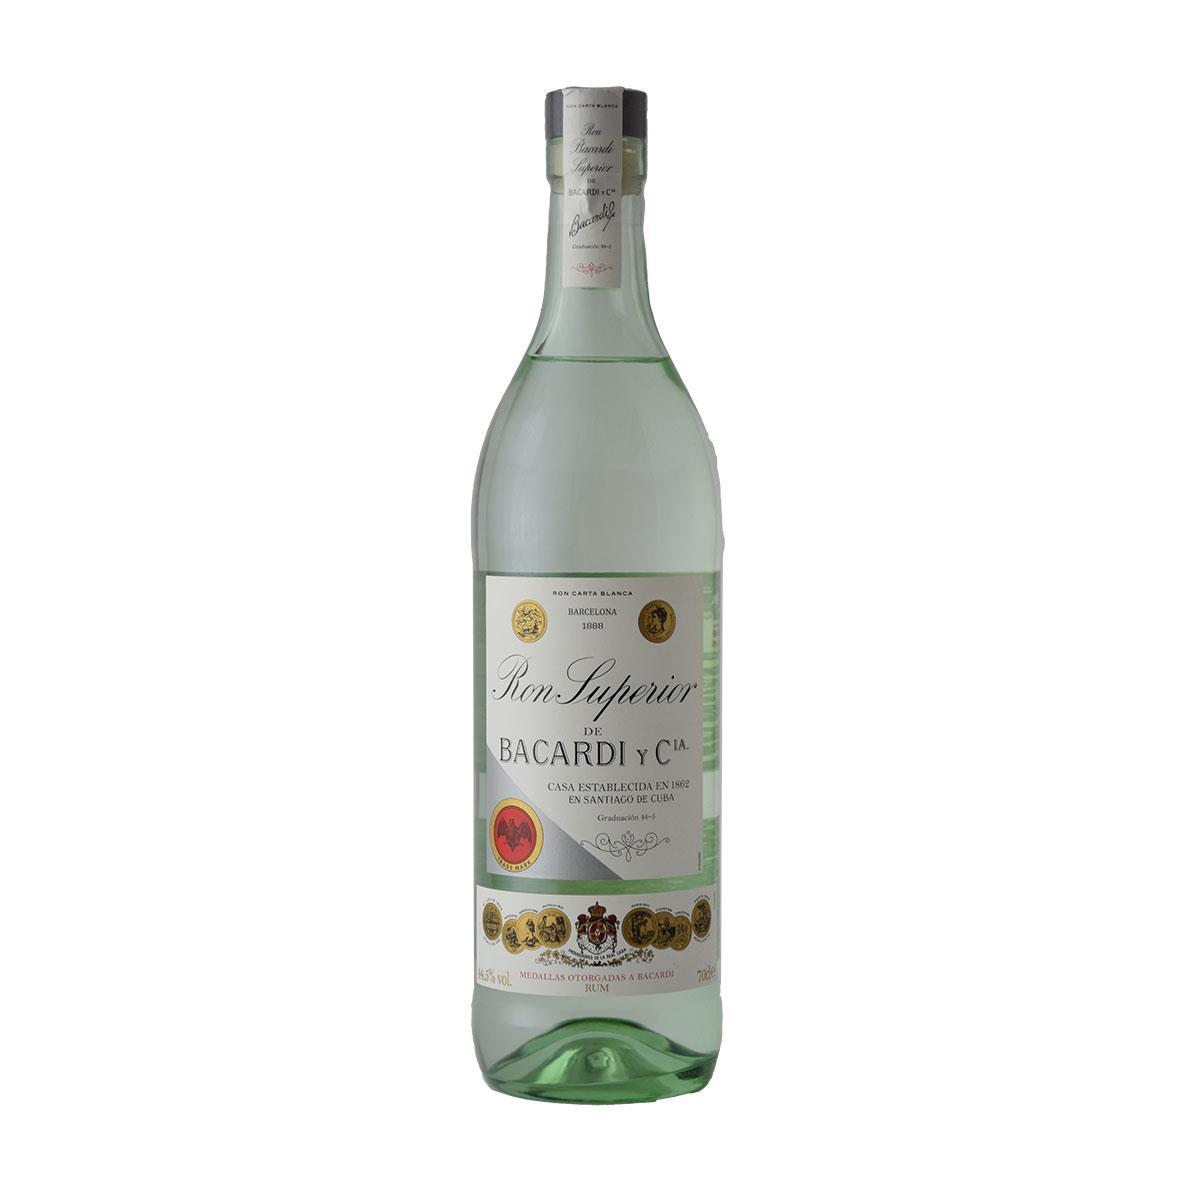 Bacardi Heritage Limited Edition Rum 700ml